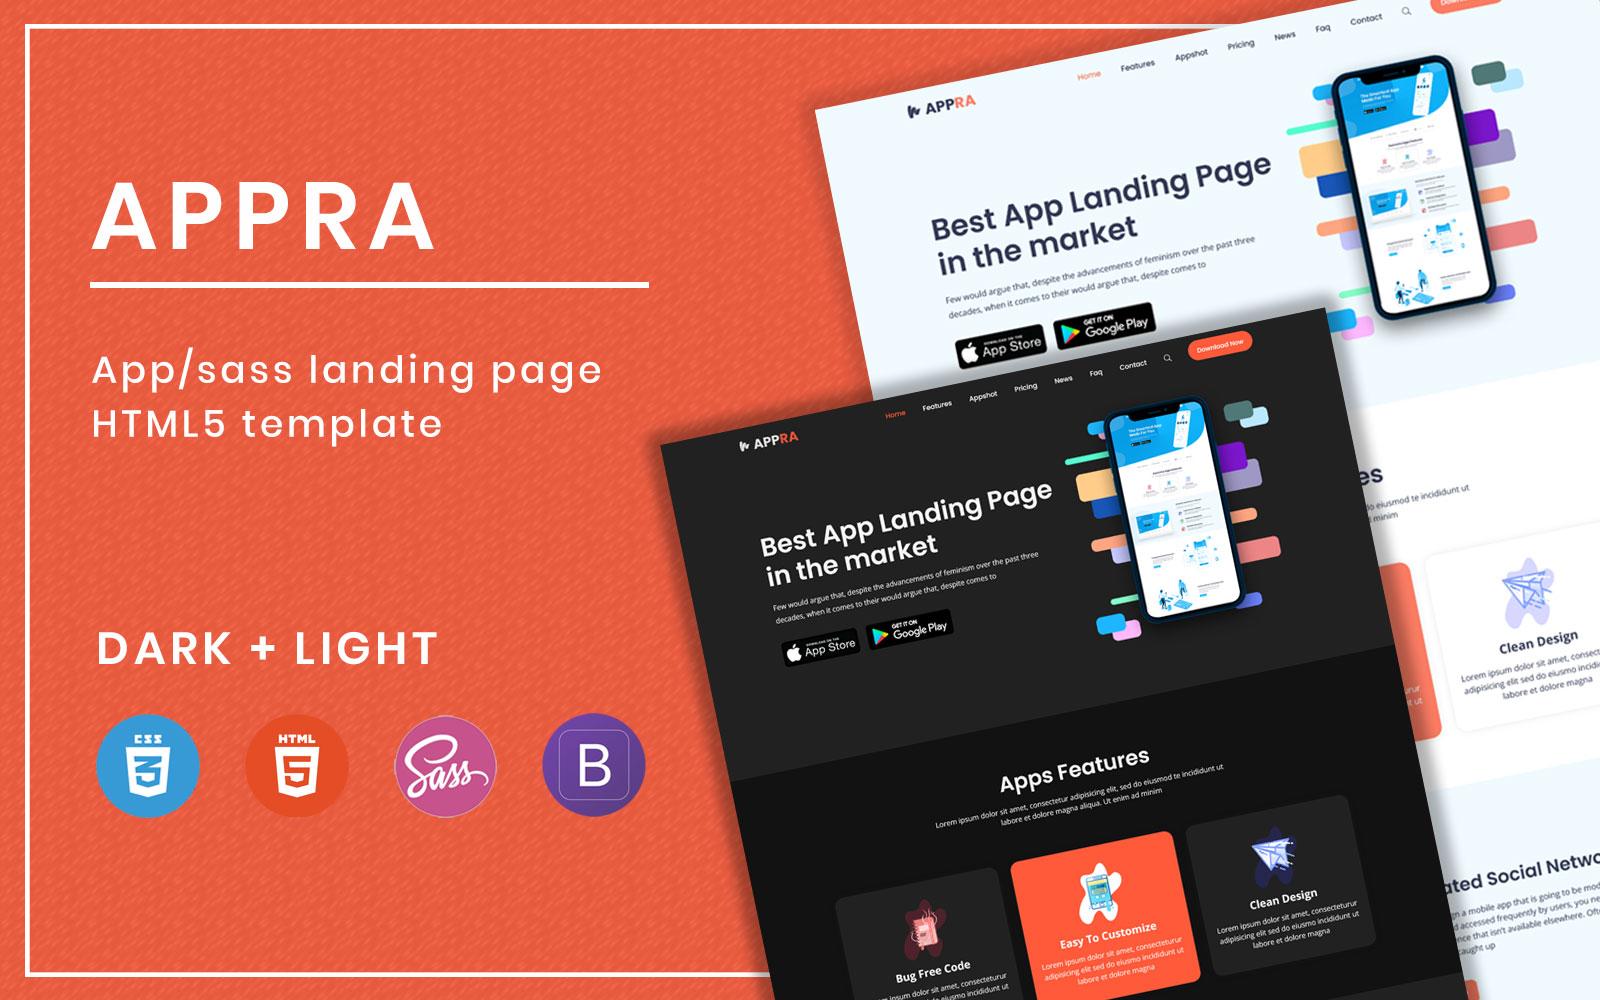 Appra - App landing page html5 template